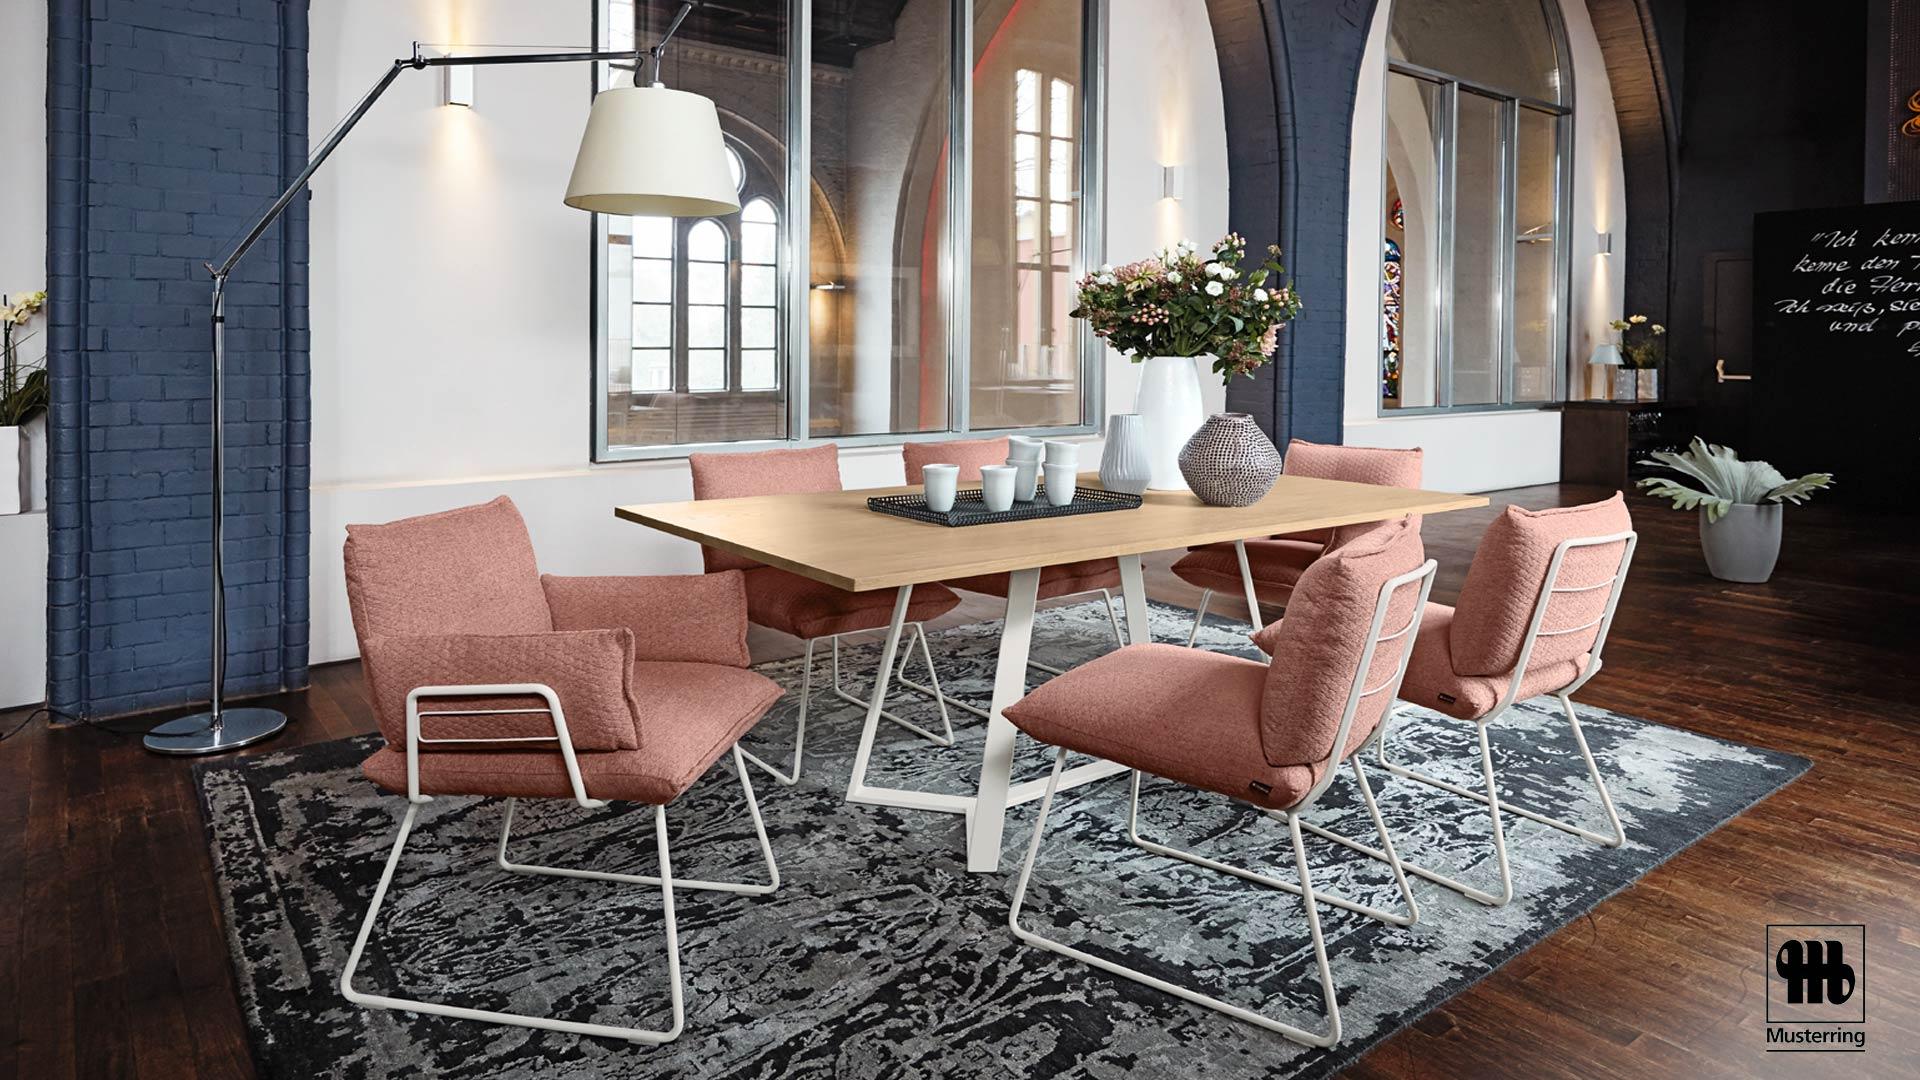 ingolstadt mbelhaus nett mbel gruber ingolstadt vorschau with ingolstadt mbelhaus news. Black Bedroom Furniture Sets. Home Design Ideas